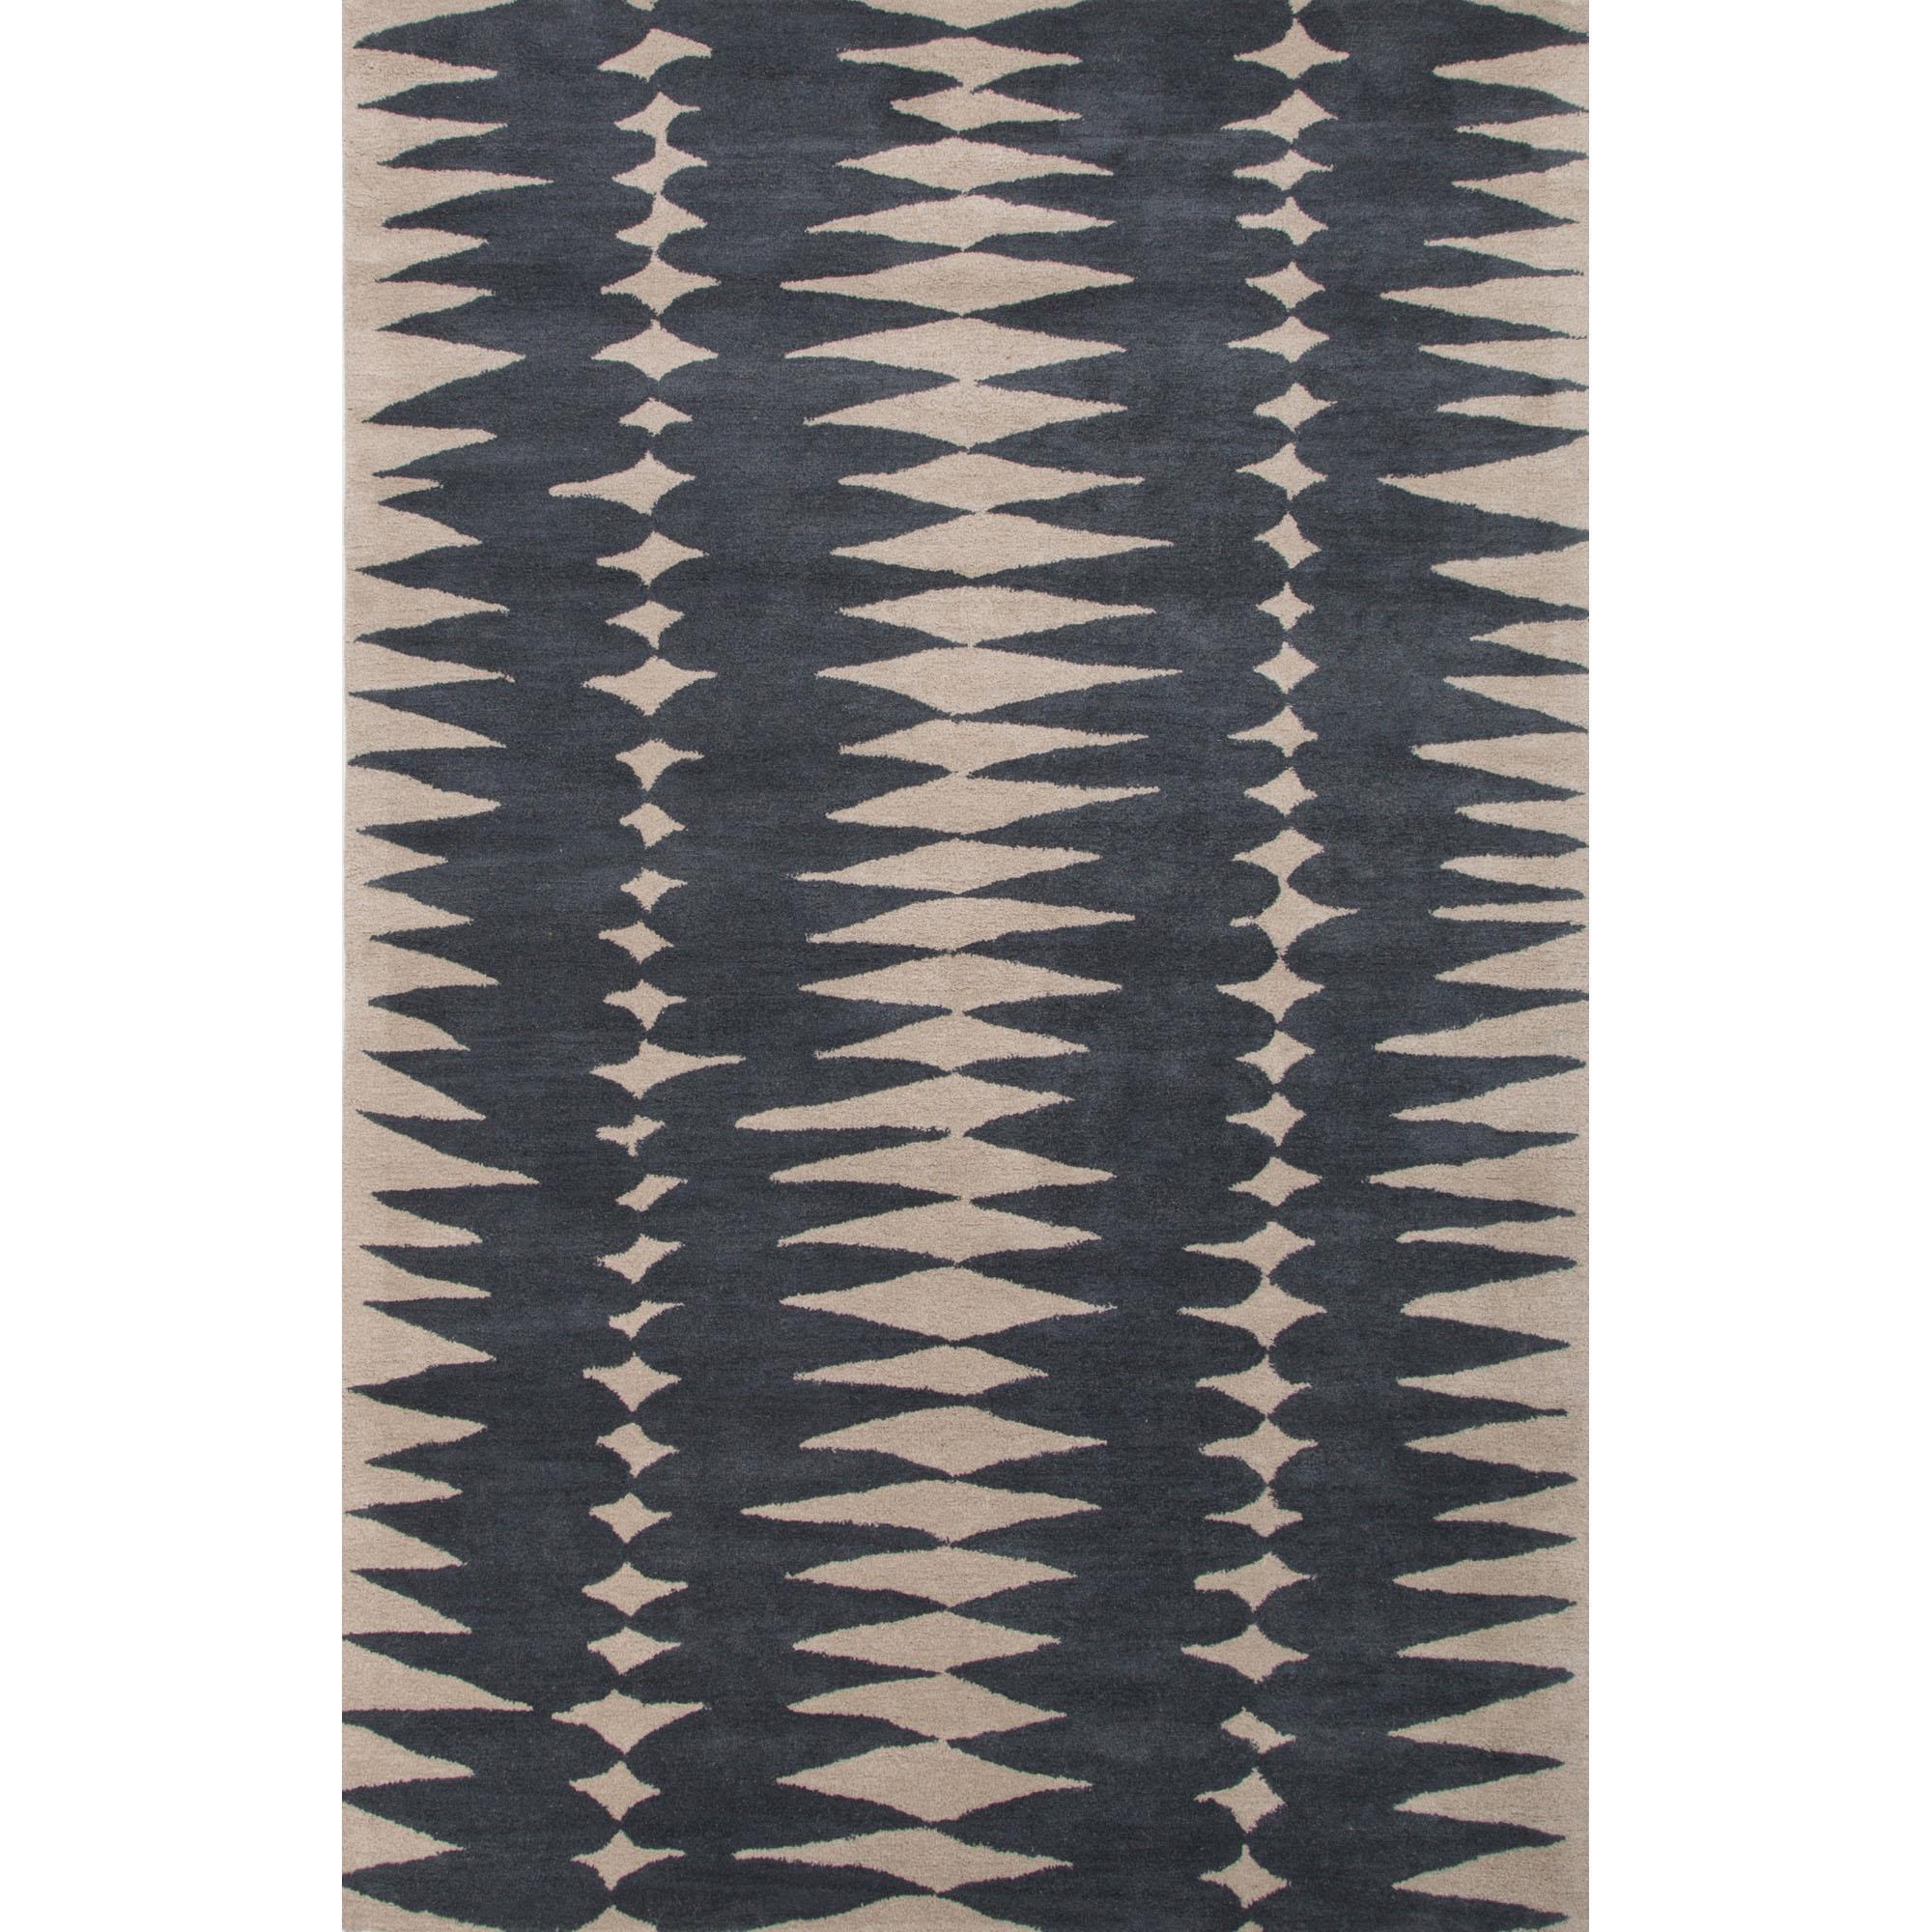 JAIPUR Rugs En Casa By Luli Sanchez Tufted 2 x 3 Rug - Item Number: RUG116812